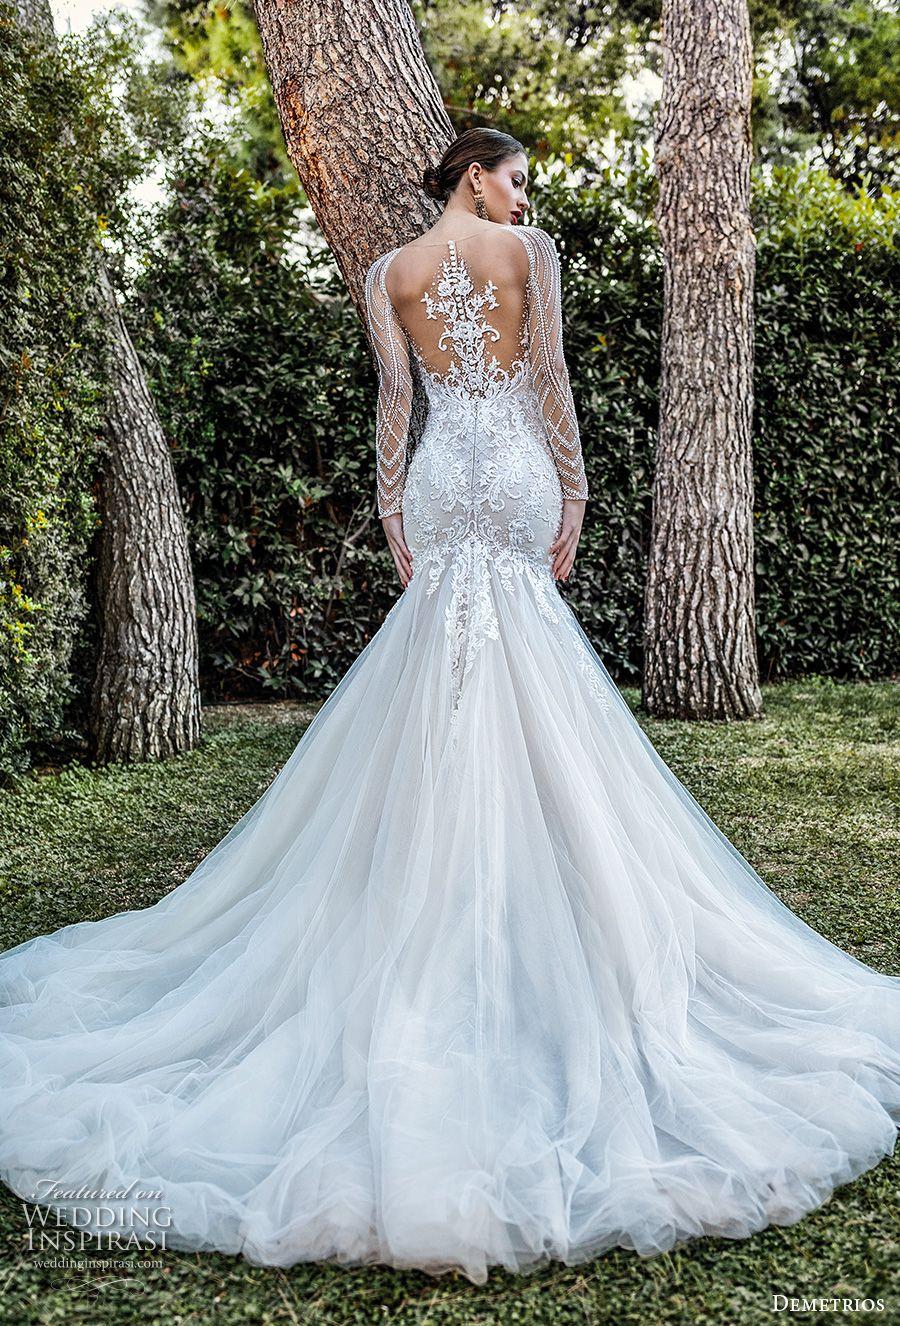 Demetrios Capsule 2020 Wedding Dresses Sophistique Bridal Collection Wedding Inspirasi Wedding Dresses Wedding Dress Long Sleeve Dream Wedding Dresses [ 1326 x 900 Pixel ]